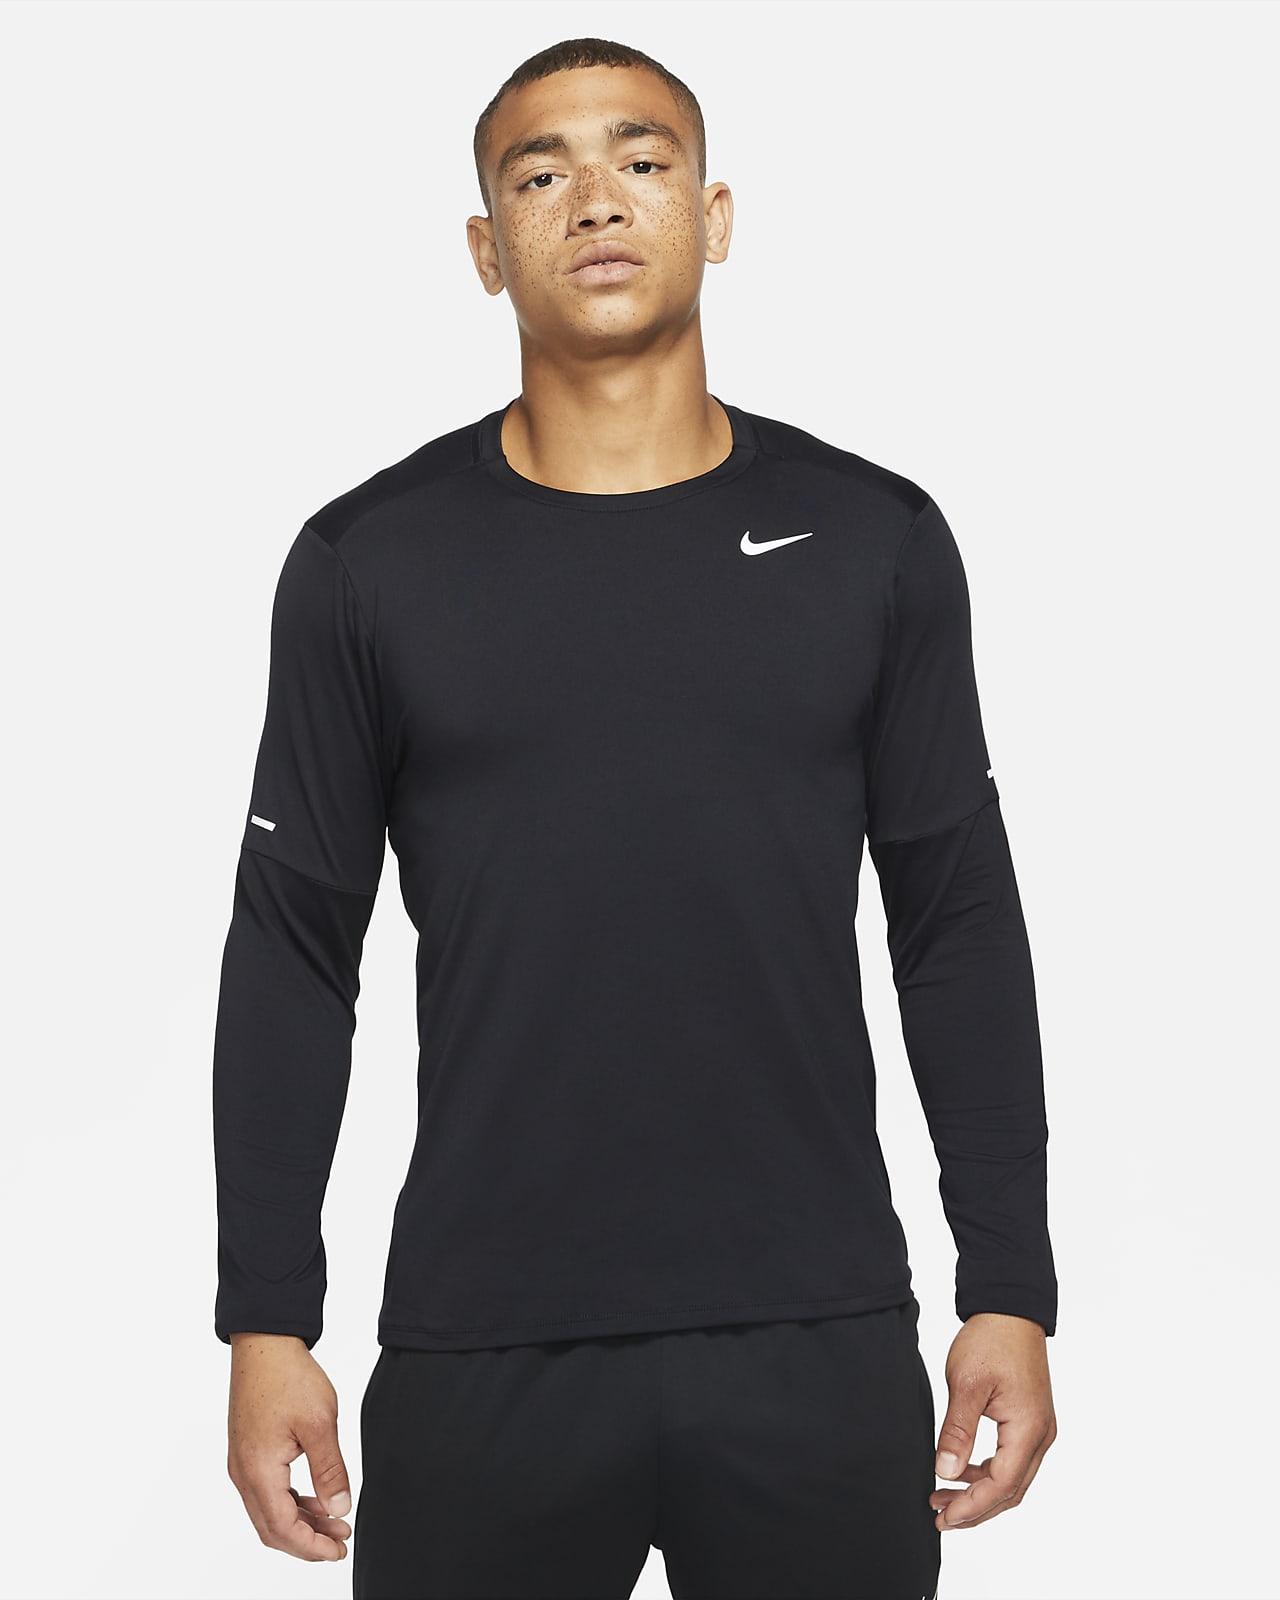 Nike Dri-FIT Element Men's Running Crew